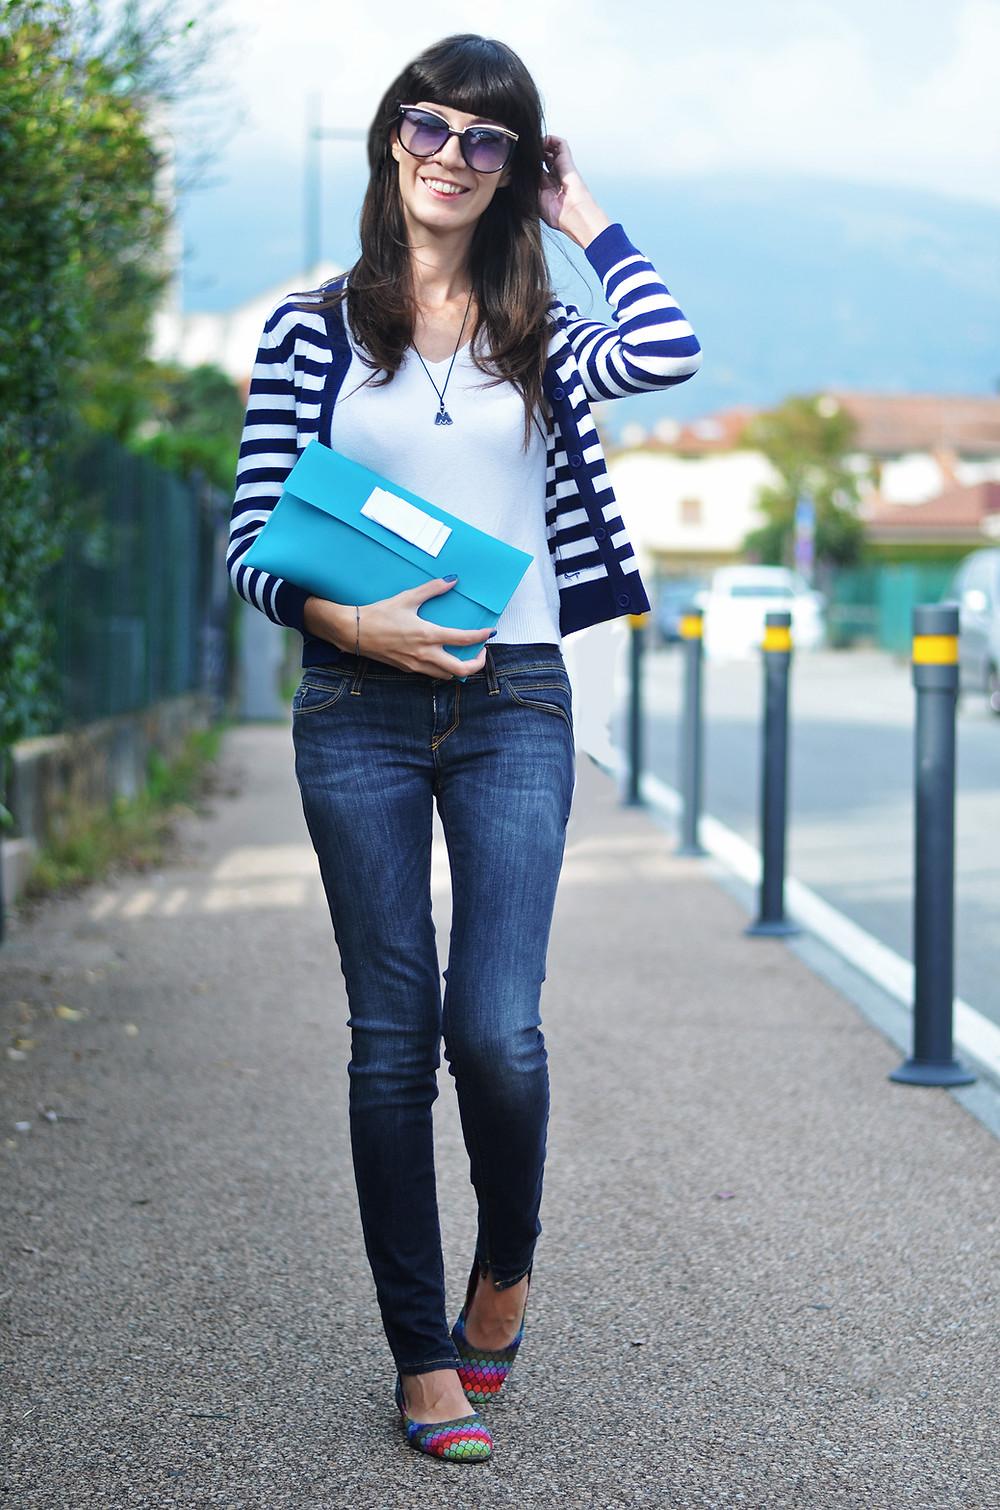 walking on the street_004.jpg